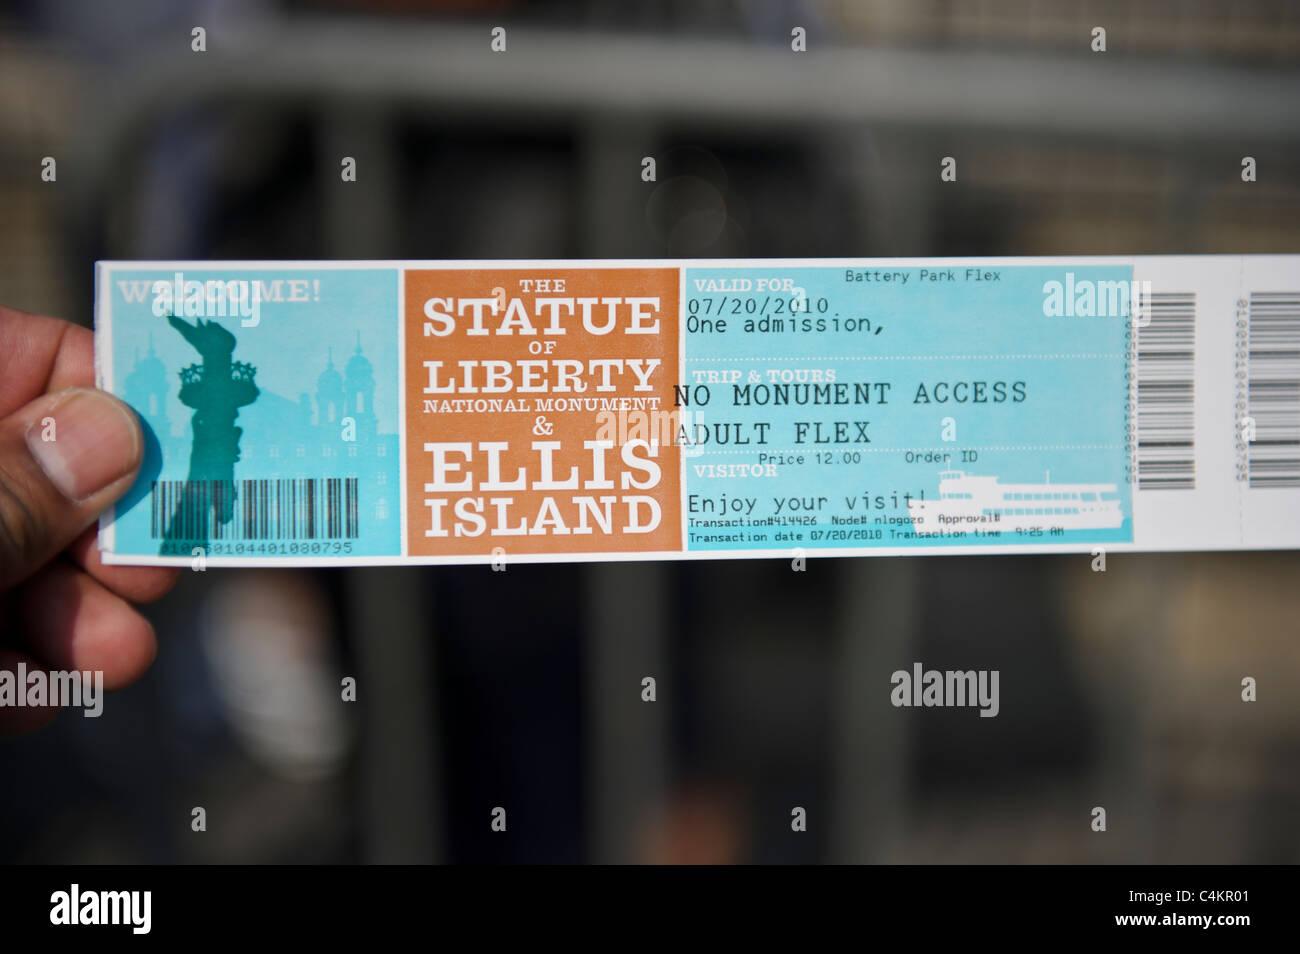 Reserve Statue Of Liberty Tickets Ellis Island Tickets